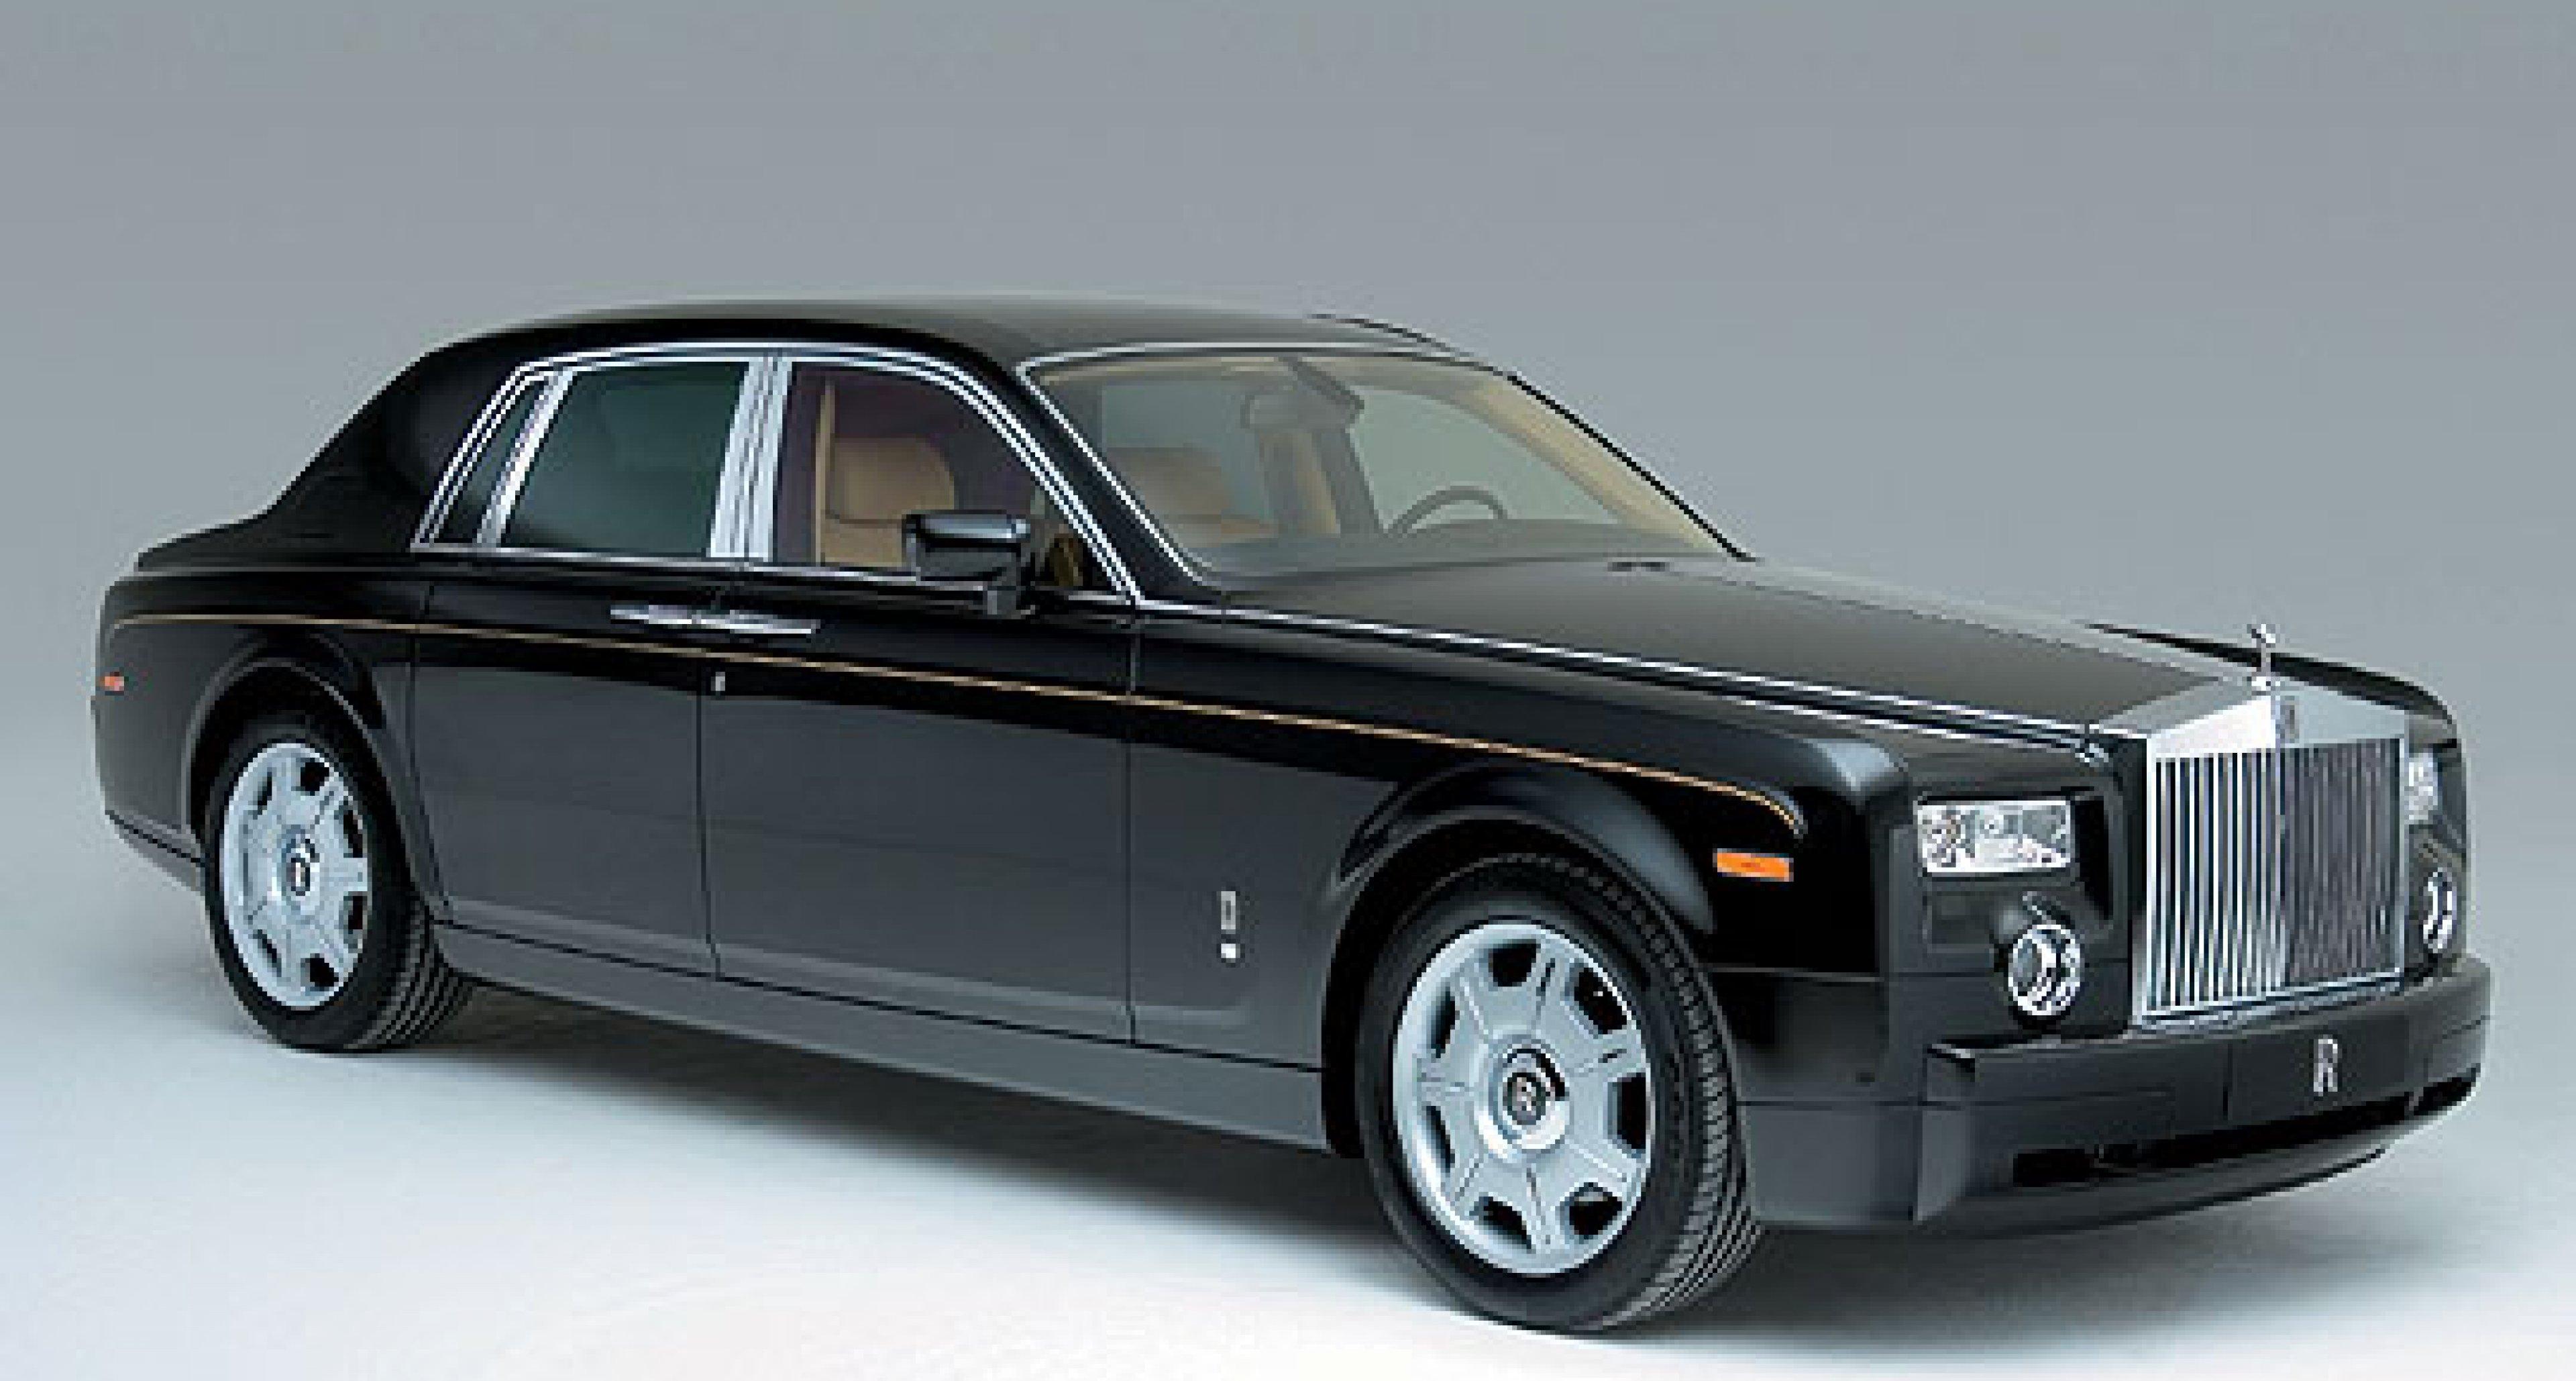 Rolls-Royce Phantom: Special GCC